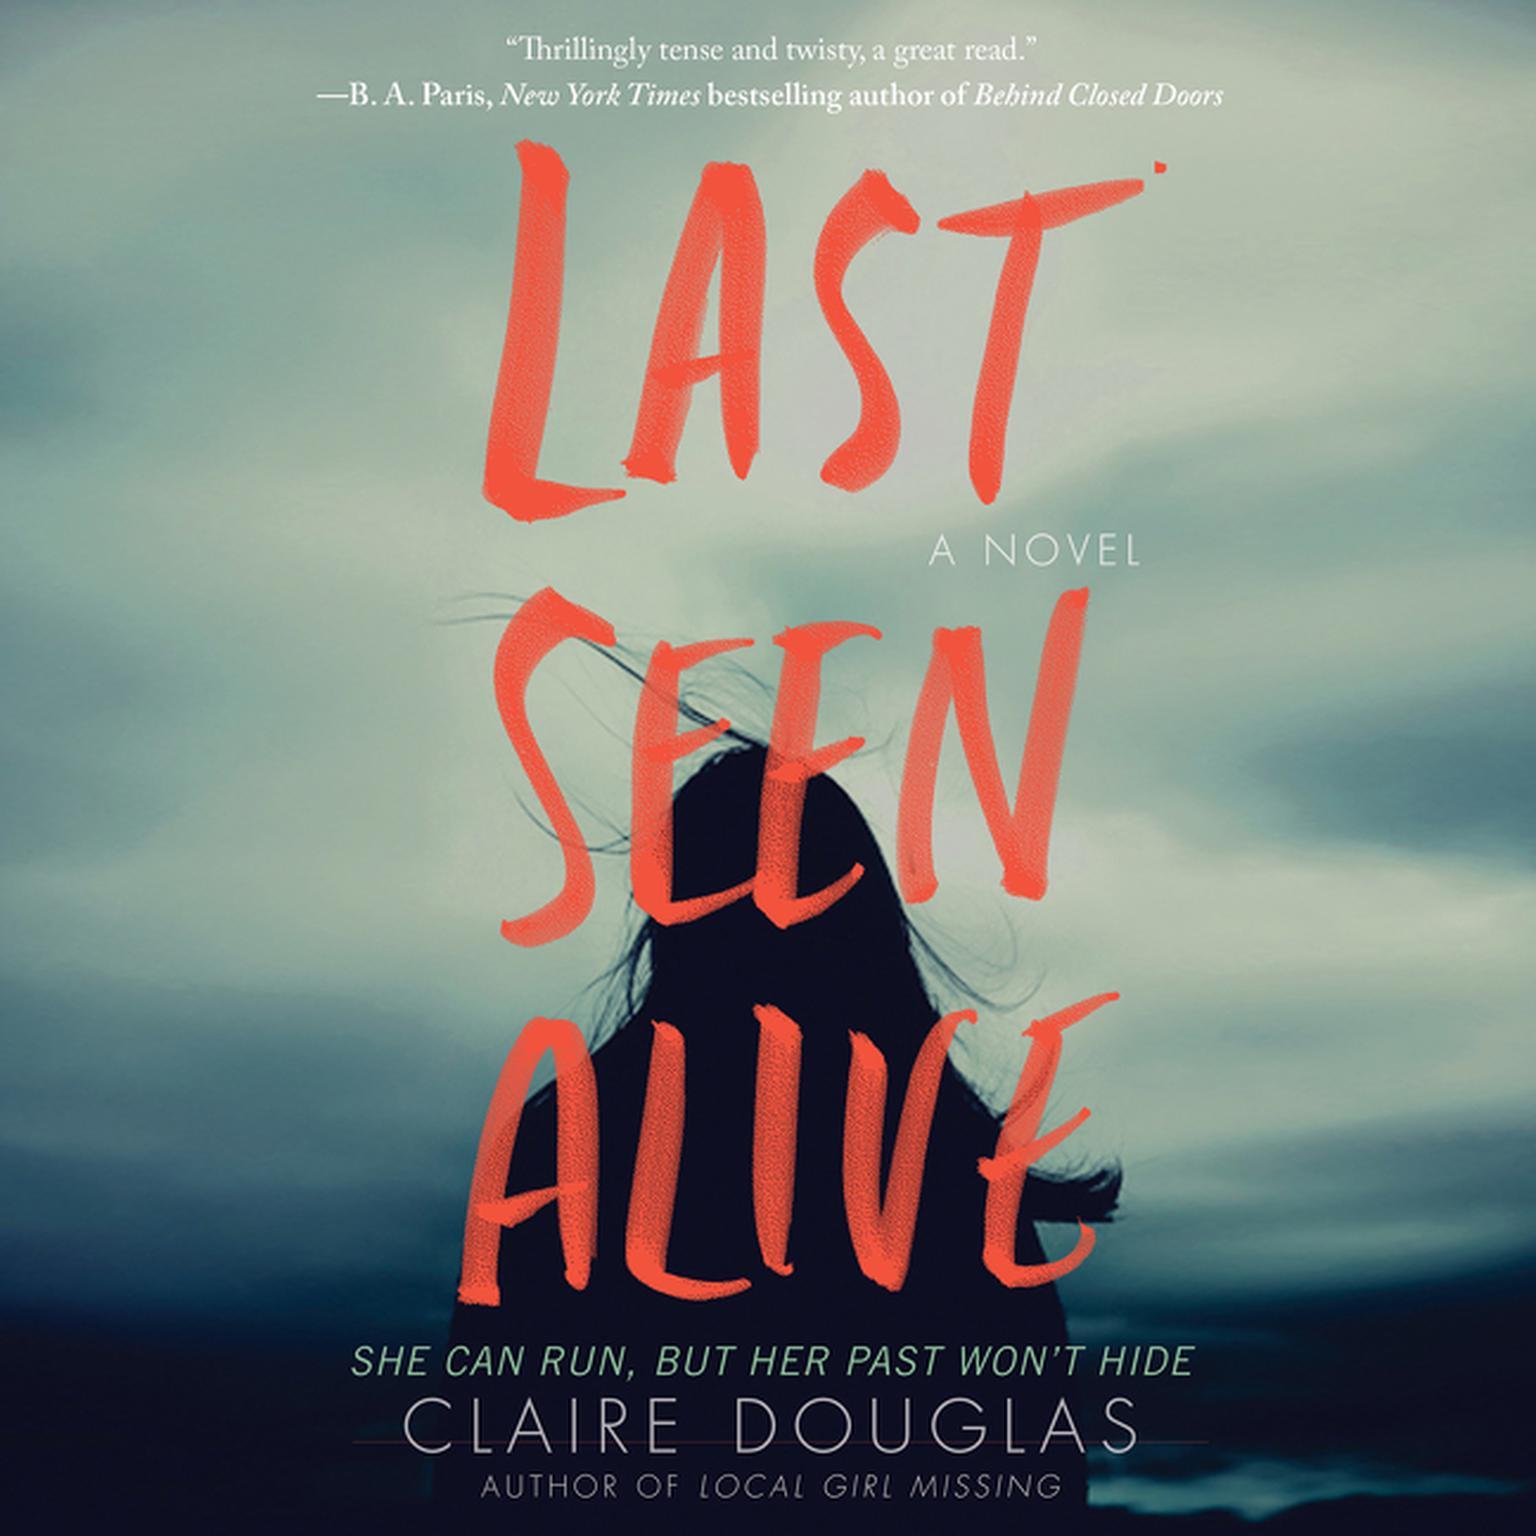 Last Seen Alive: A Novel Audiobook, by Claire Douglas